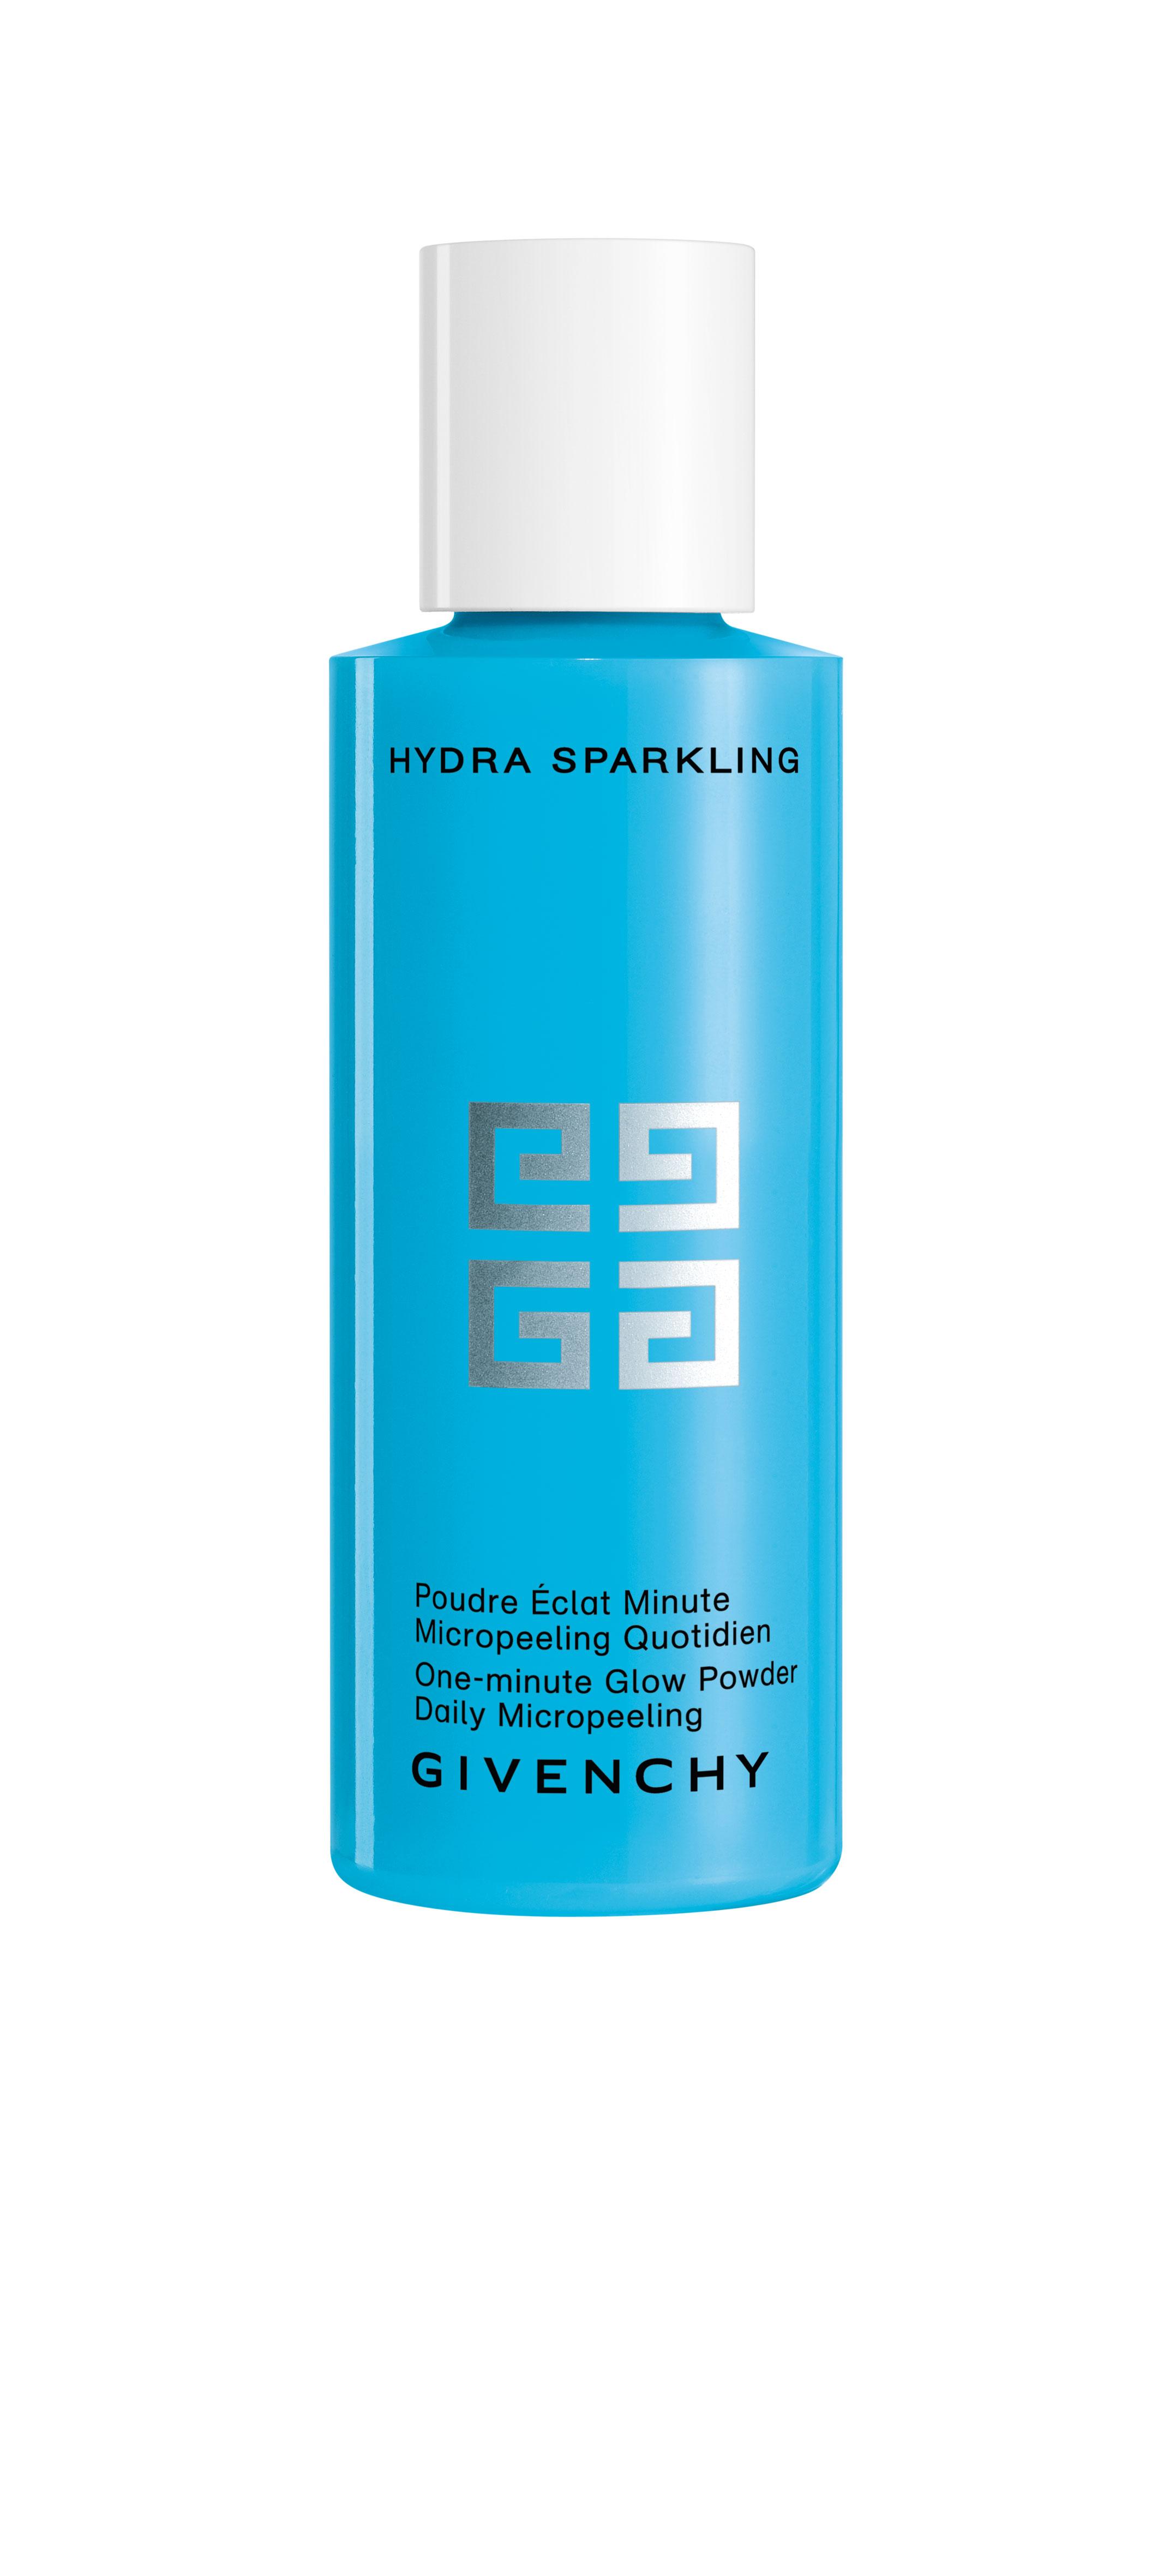 huid6-HYDRA-SPARKLING-Poudre-Nettoyante-2014-HD